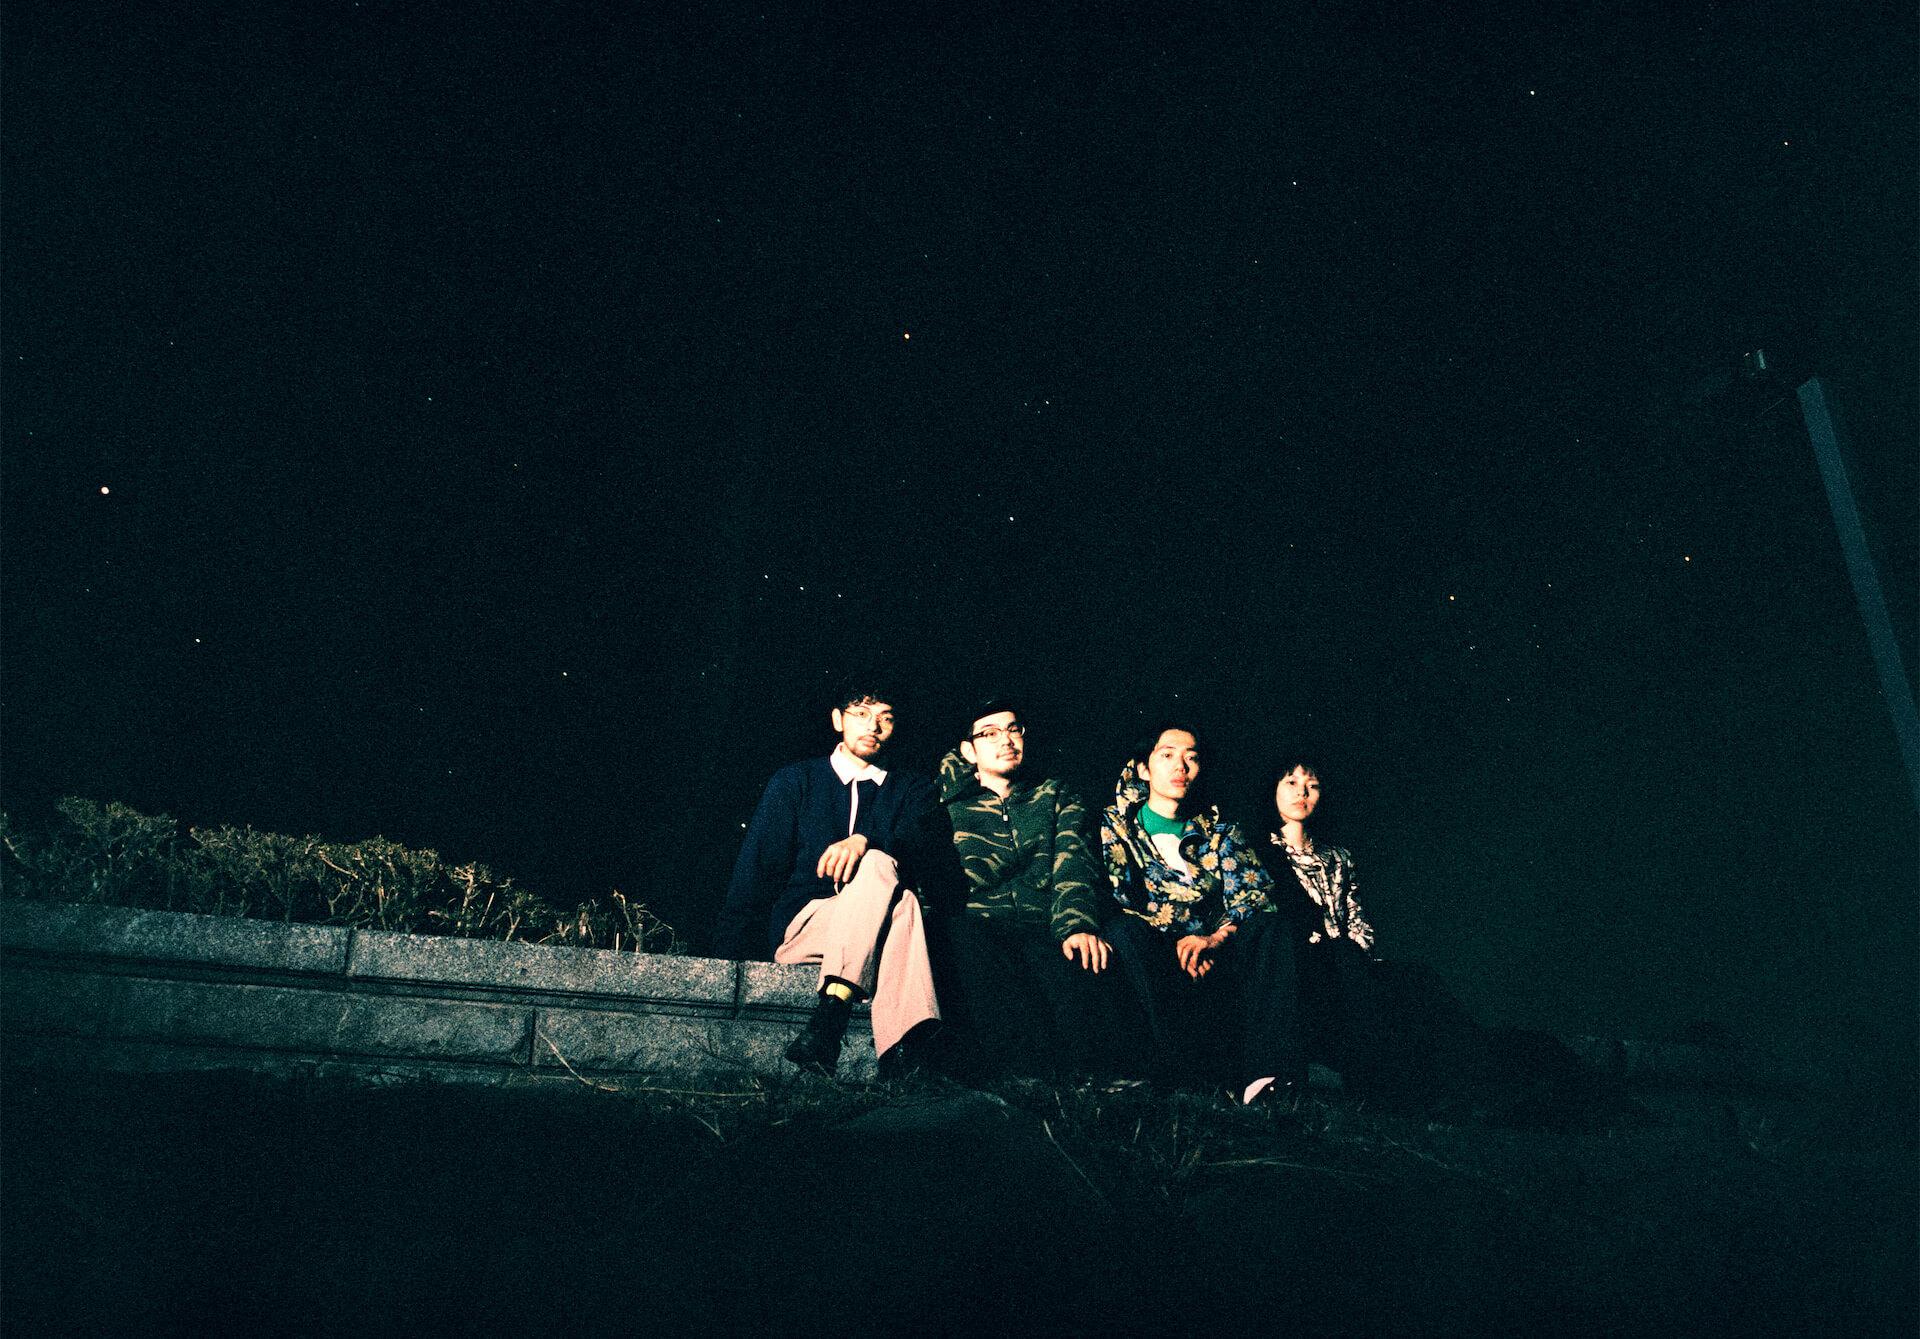 WWWの2マンシリーズイベント<dots>にて、MONO NO AWAREとHelsinki Lambda Clubが共演決定! music210512_www_dots_1